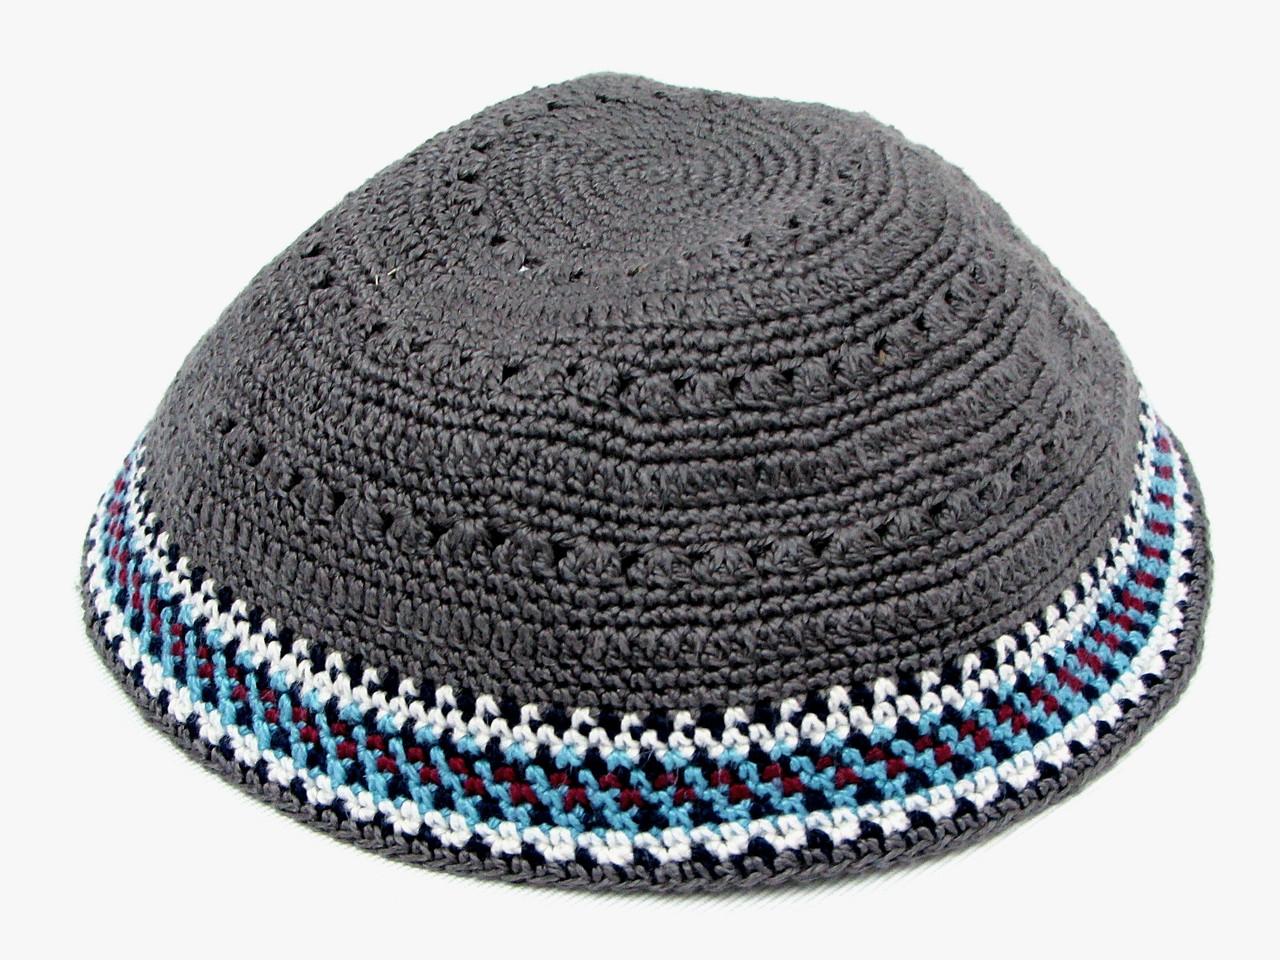 Gray DMC Knitted Kippah with Burgundy, White & Blue